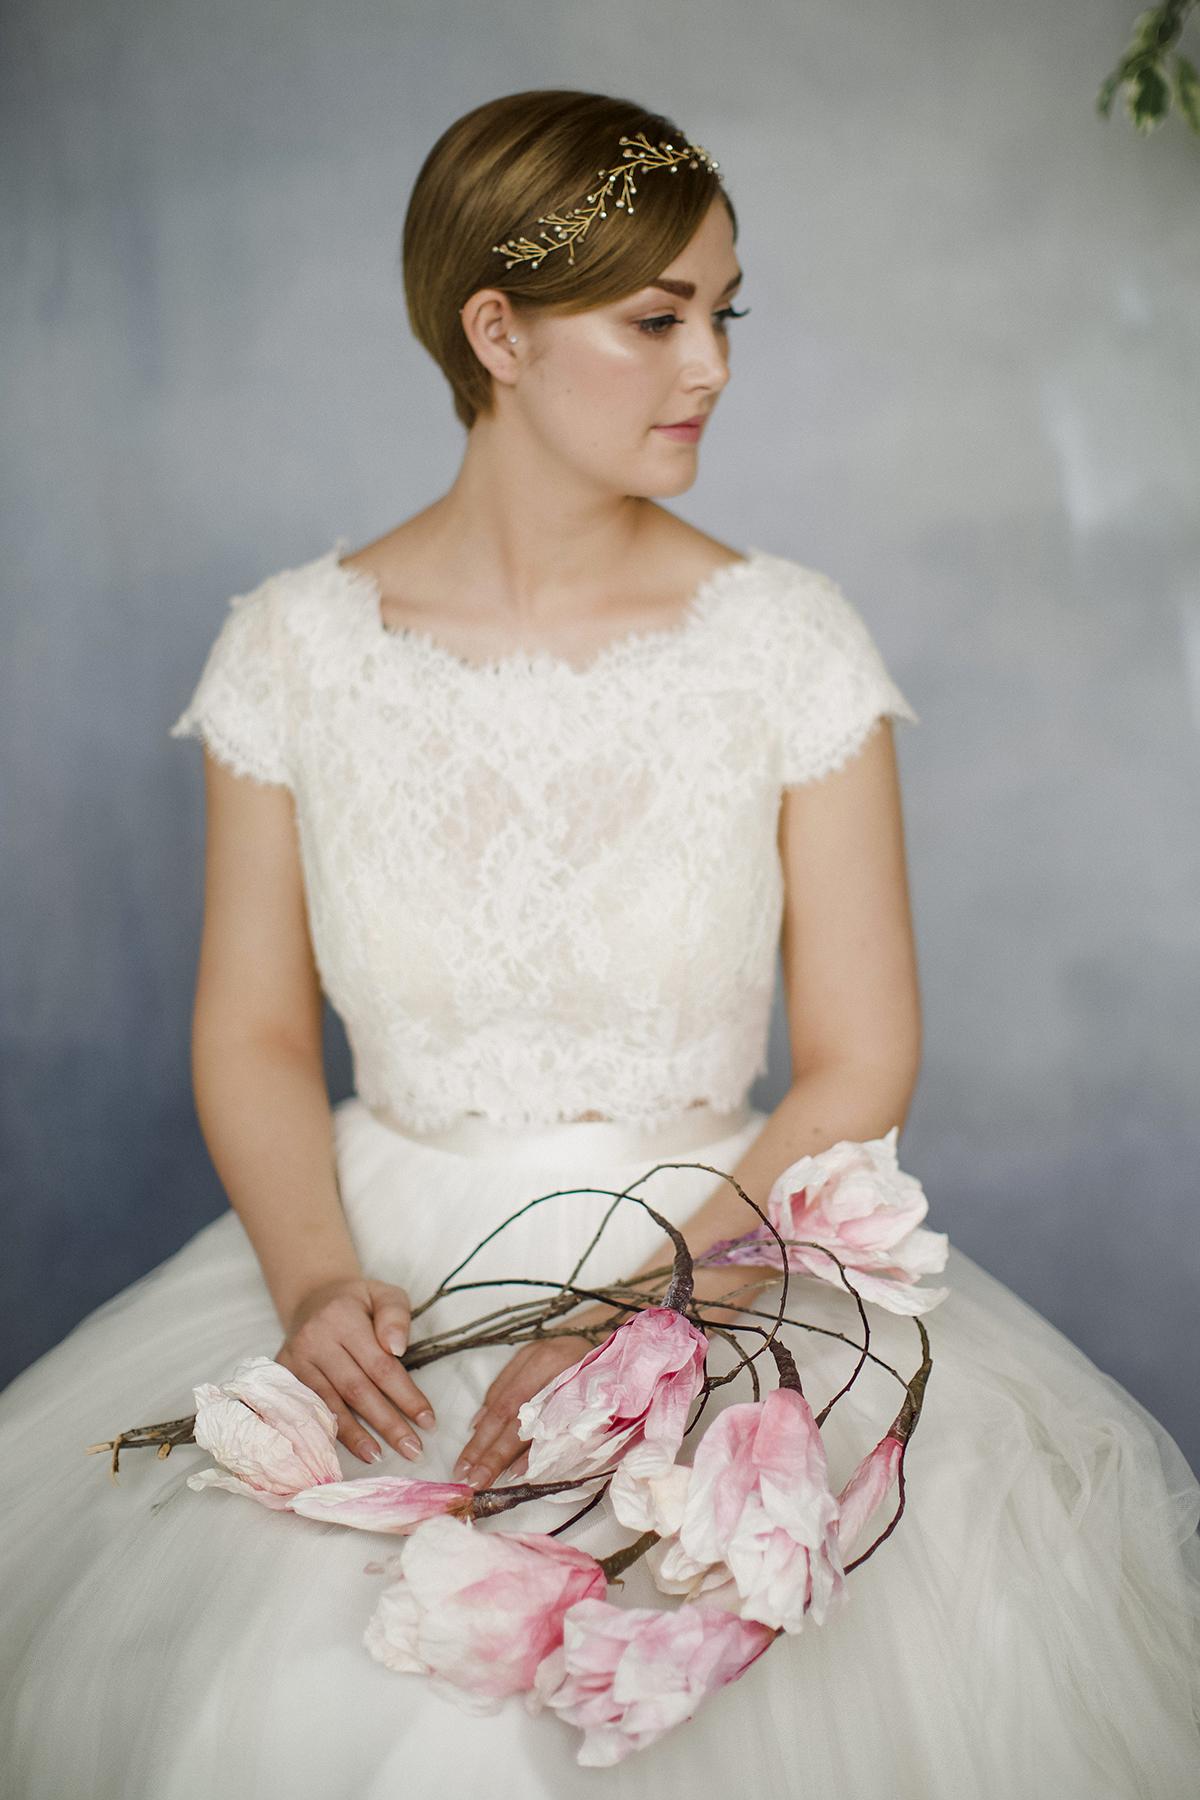 Short Hair for Wedding Dress